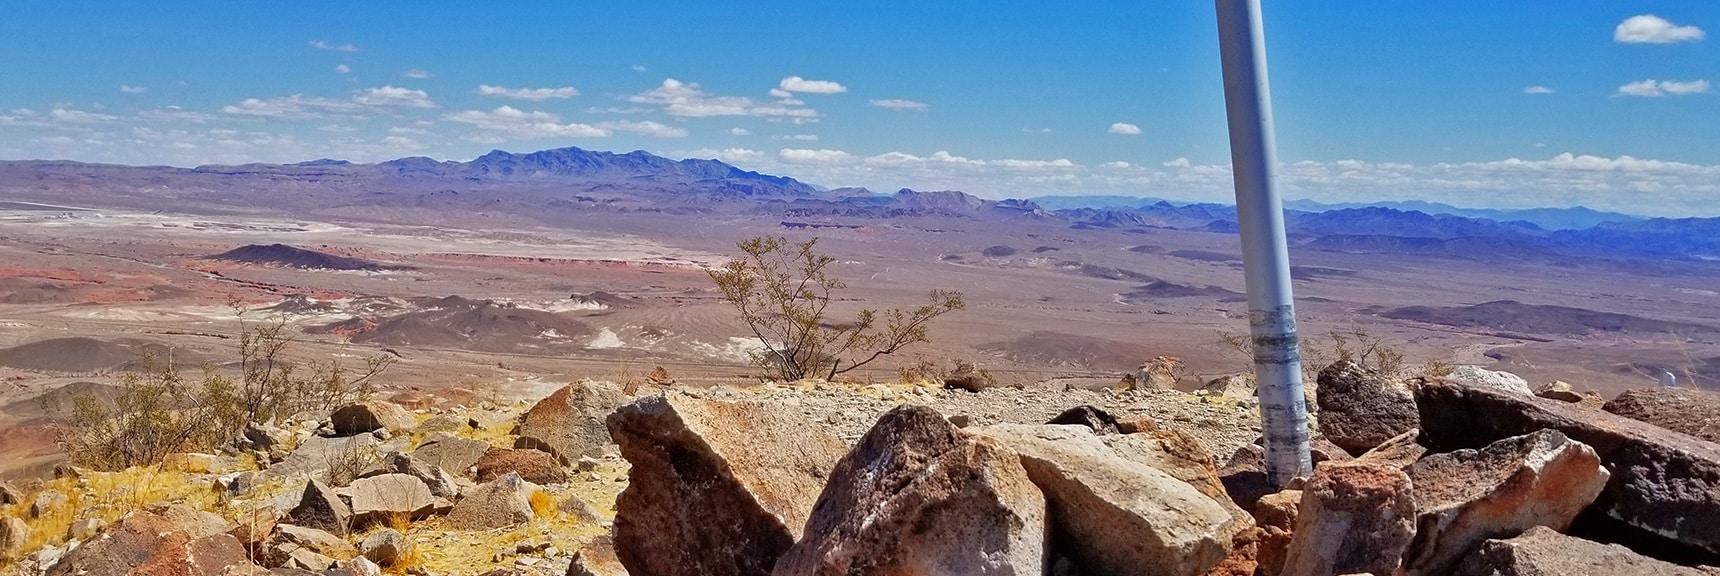 Muddy Mts., Anniversary Ridge, Black Mesa, Hamblin Mts. from Summit | Lava Butte | Lake Mead National Recreation Area, Nevada